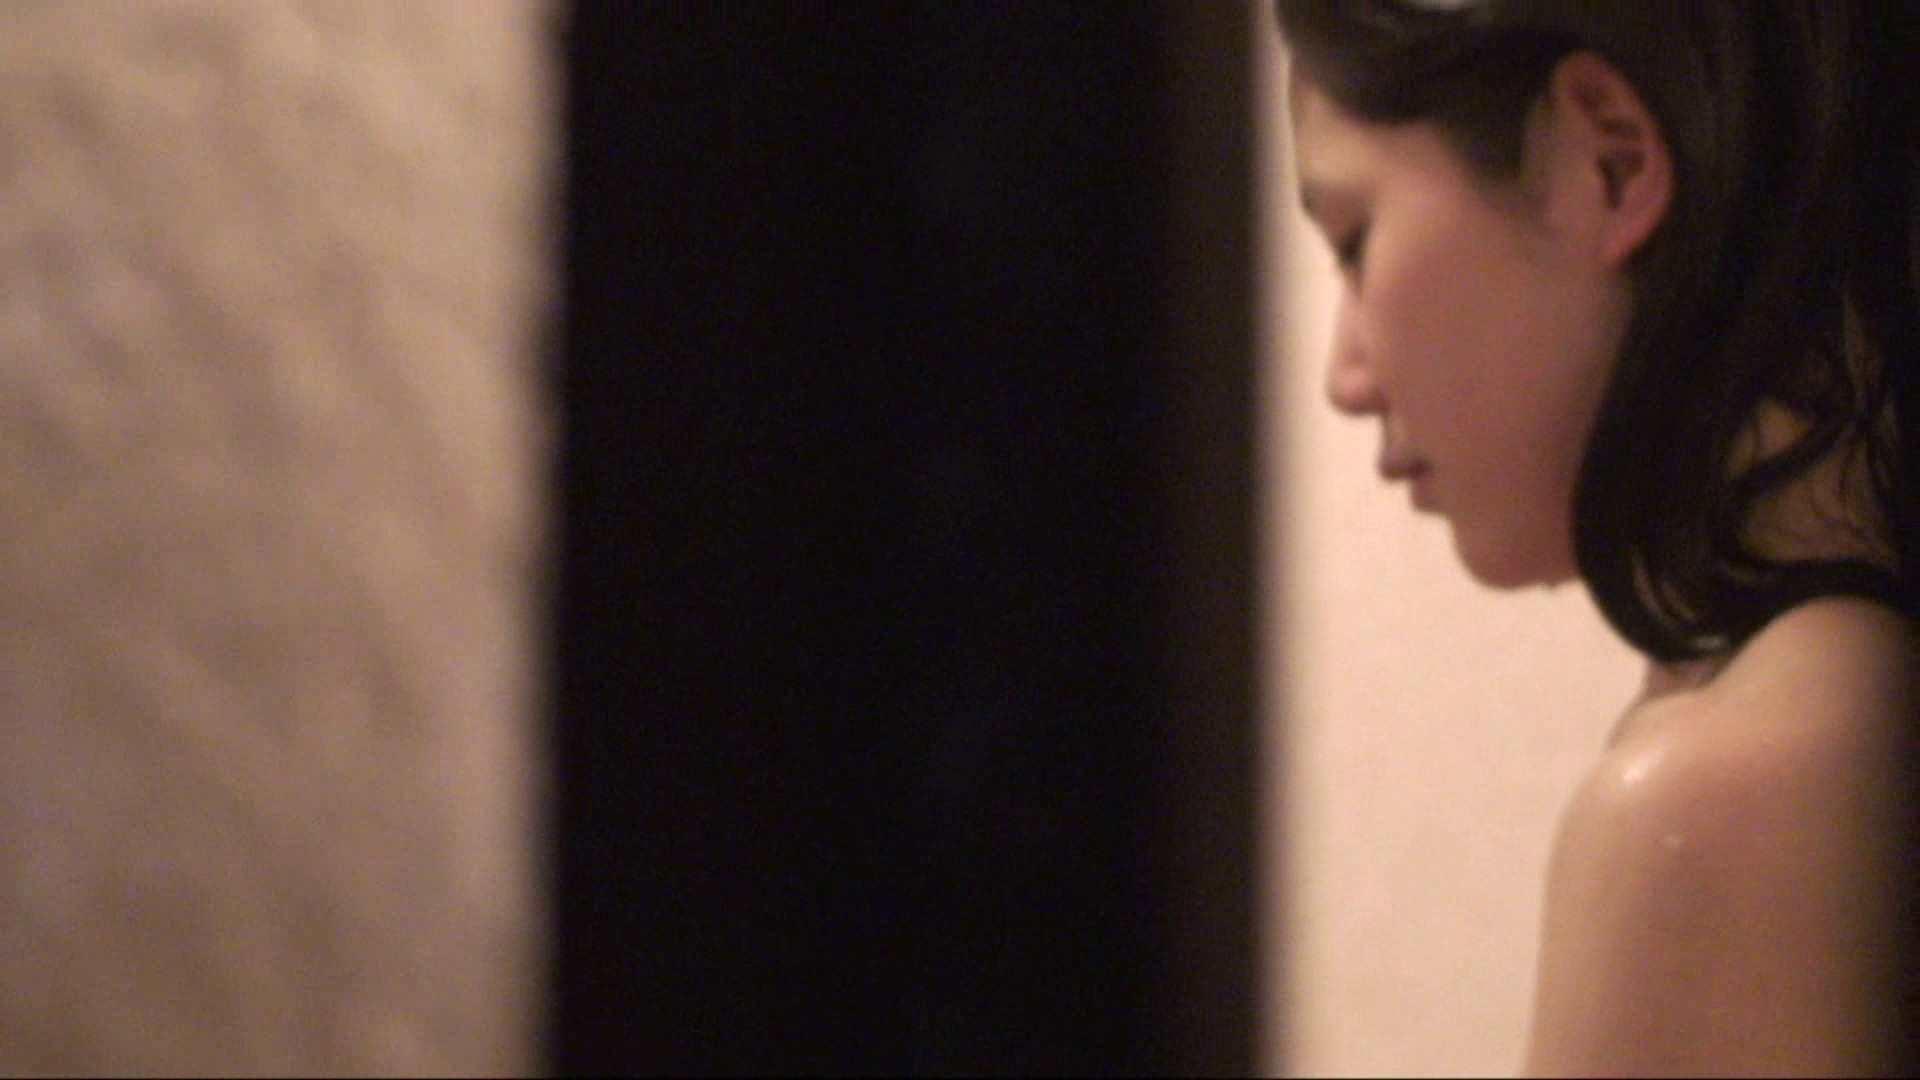 vol.01必見!白肌嬢の乳首が丸見え。極上美人のすっぴん顔をハイビジョンで! 覗き | 全身丸見え  43連発 5